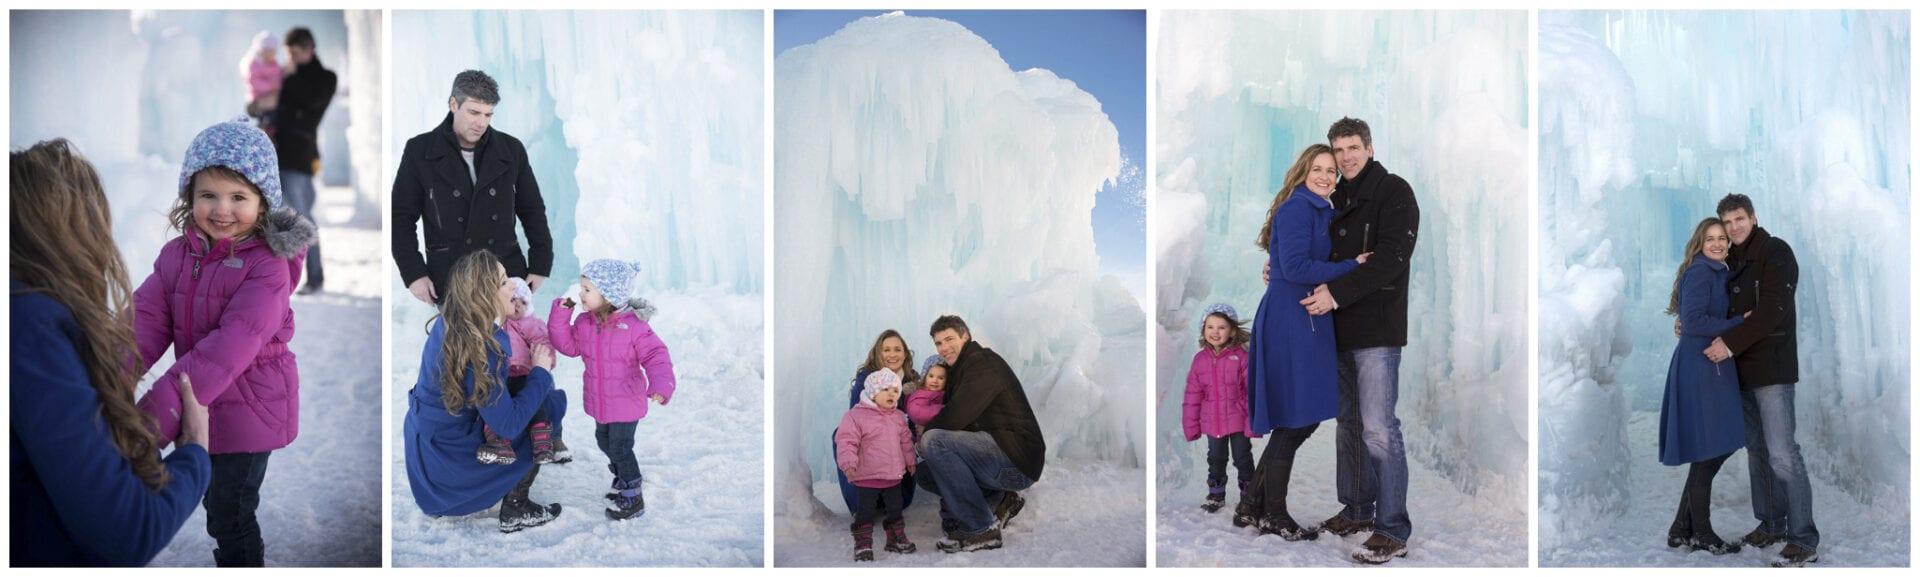 Edmonton-Winter-Family-Outdoor-Portrait-Photography-Ice-Castles